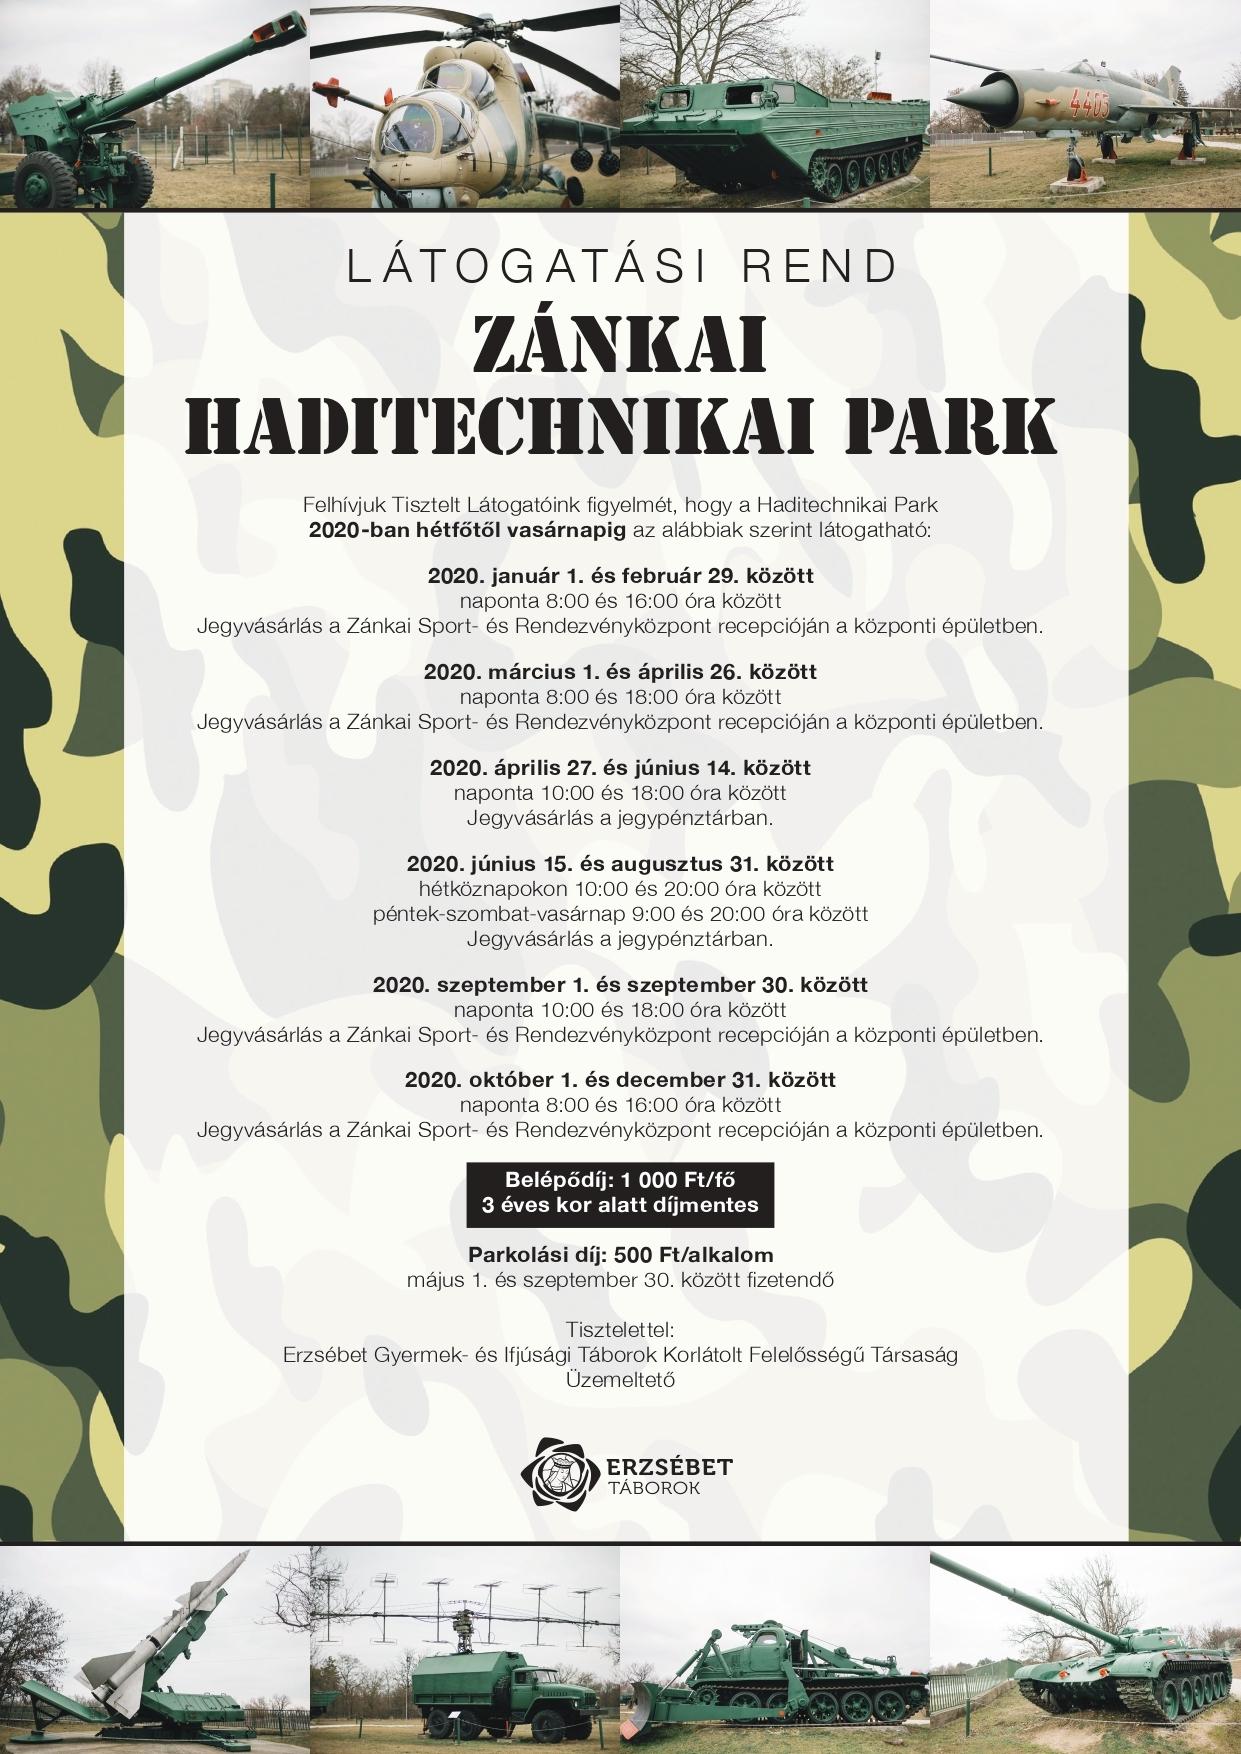 et_haditech_park_latogatasi_rend_2020.jpg